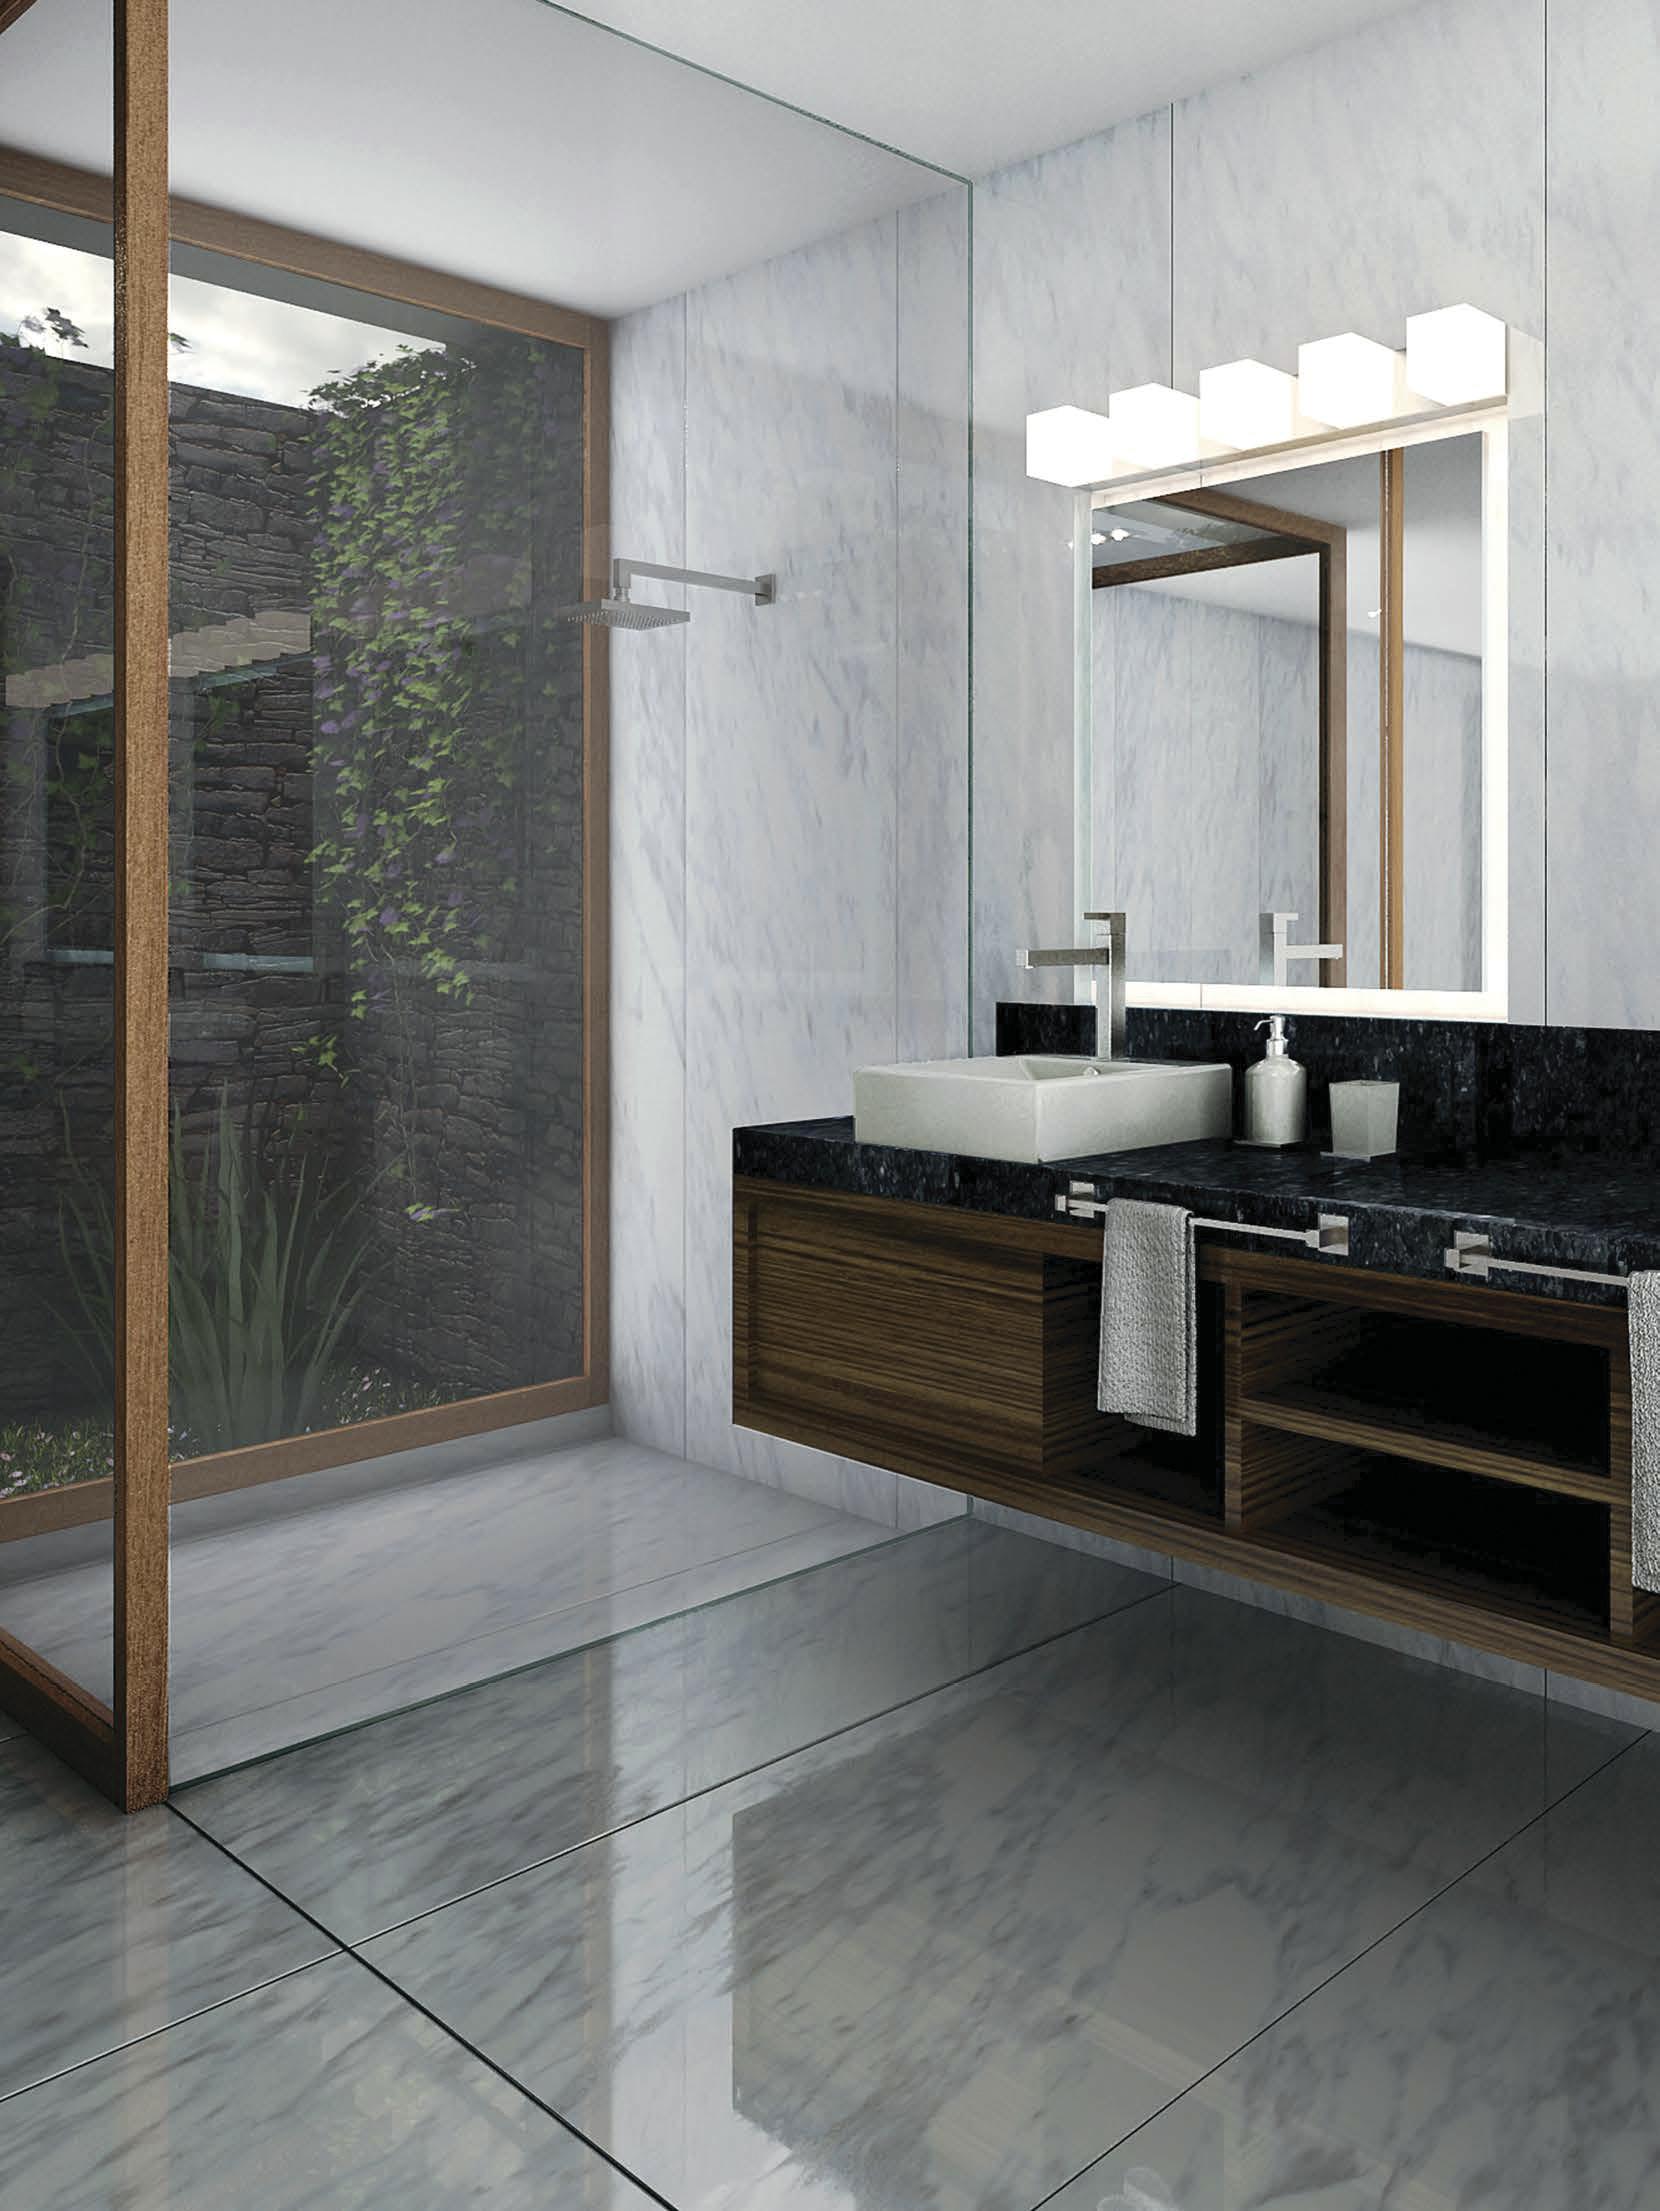 Accesorios De Baño Helvex:Muebles para baño – Bienvenidos a Grupo SAR